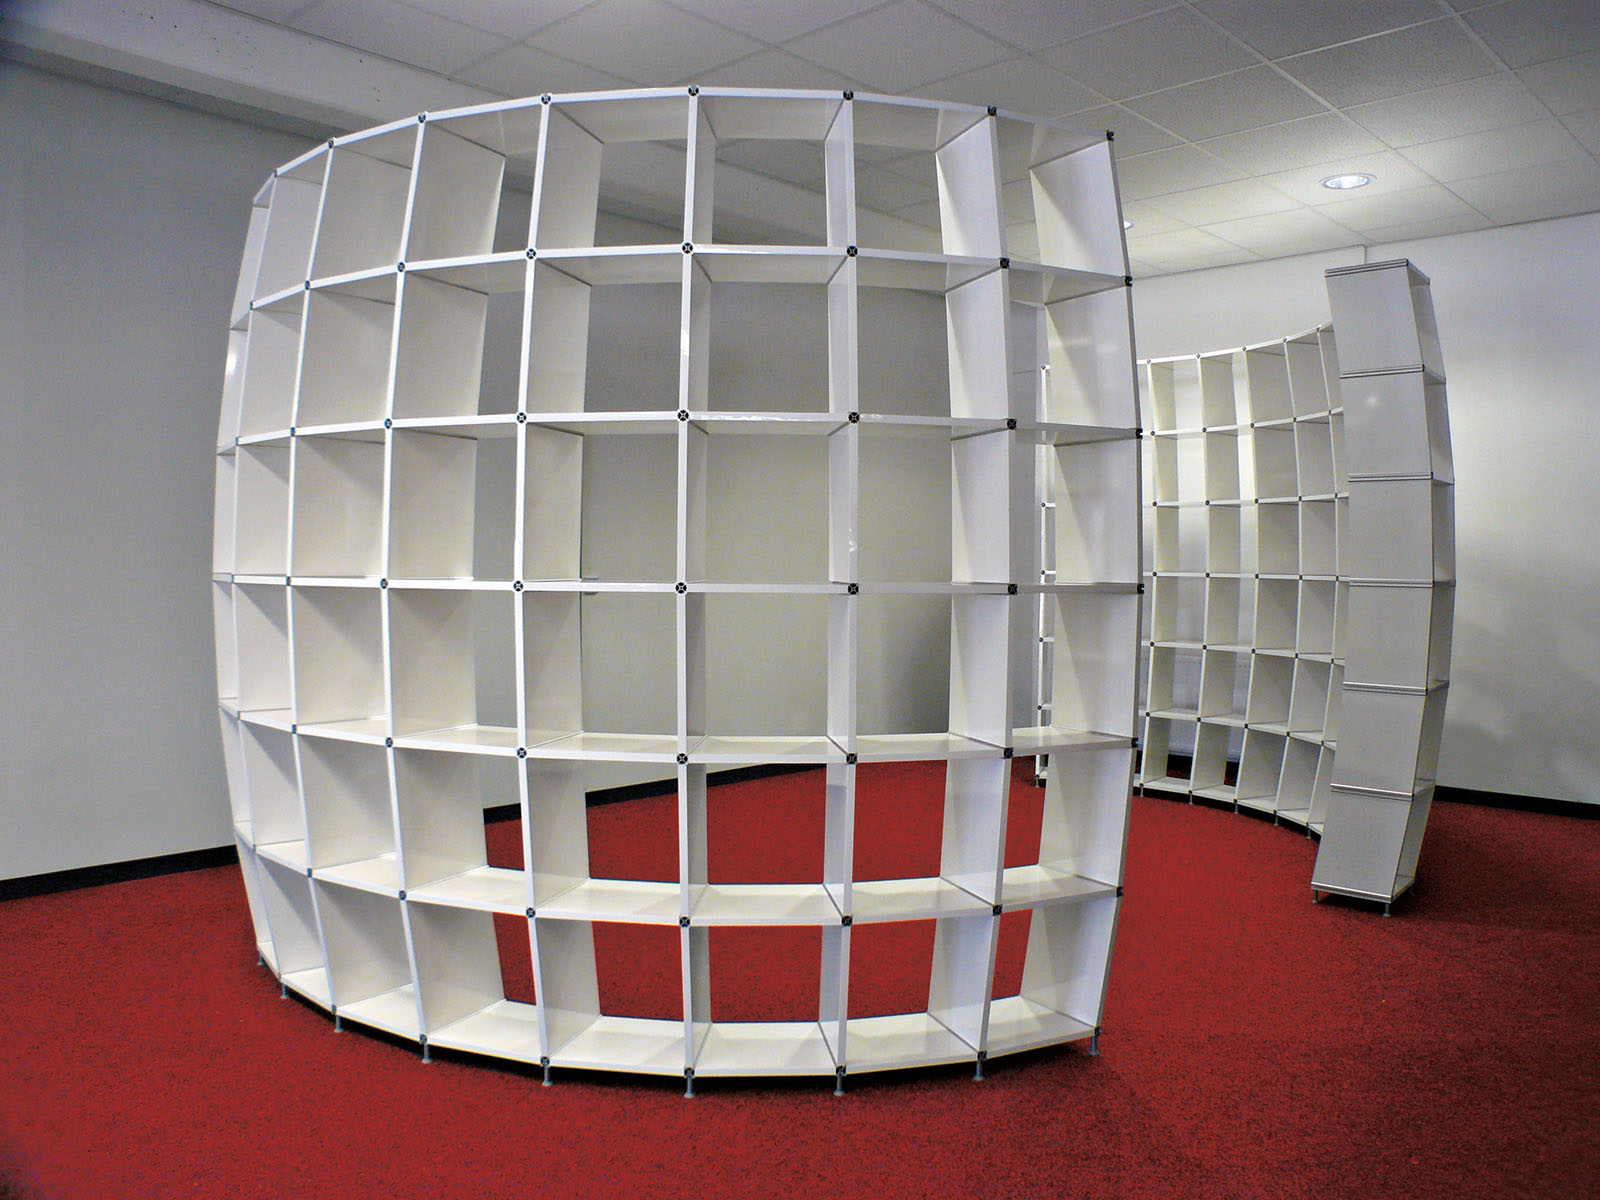 knelldesign   Regalsystem Beschreibung   Das innovative Möbel-System ...